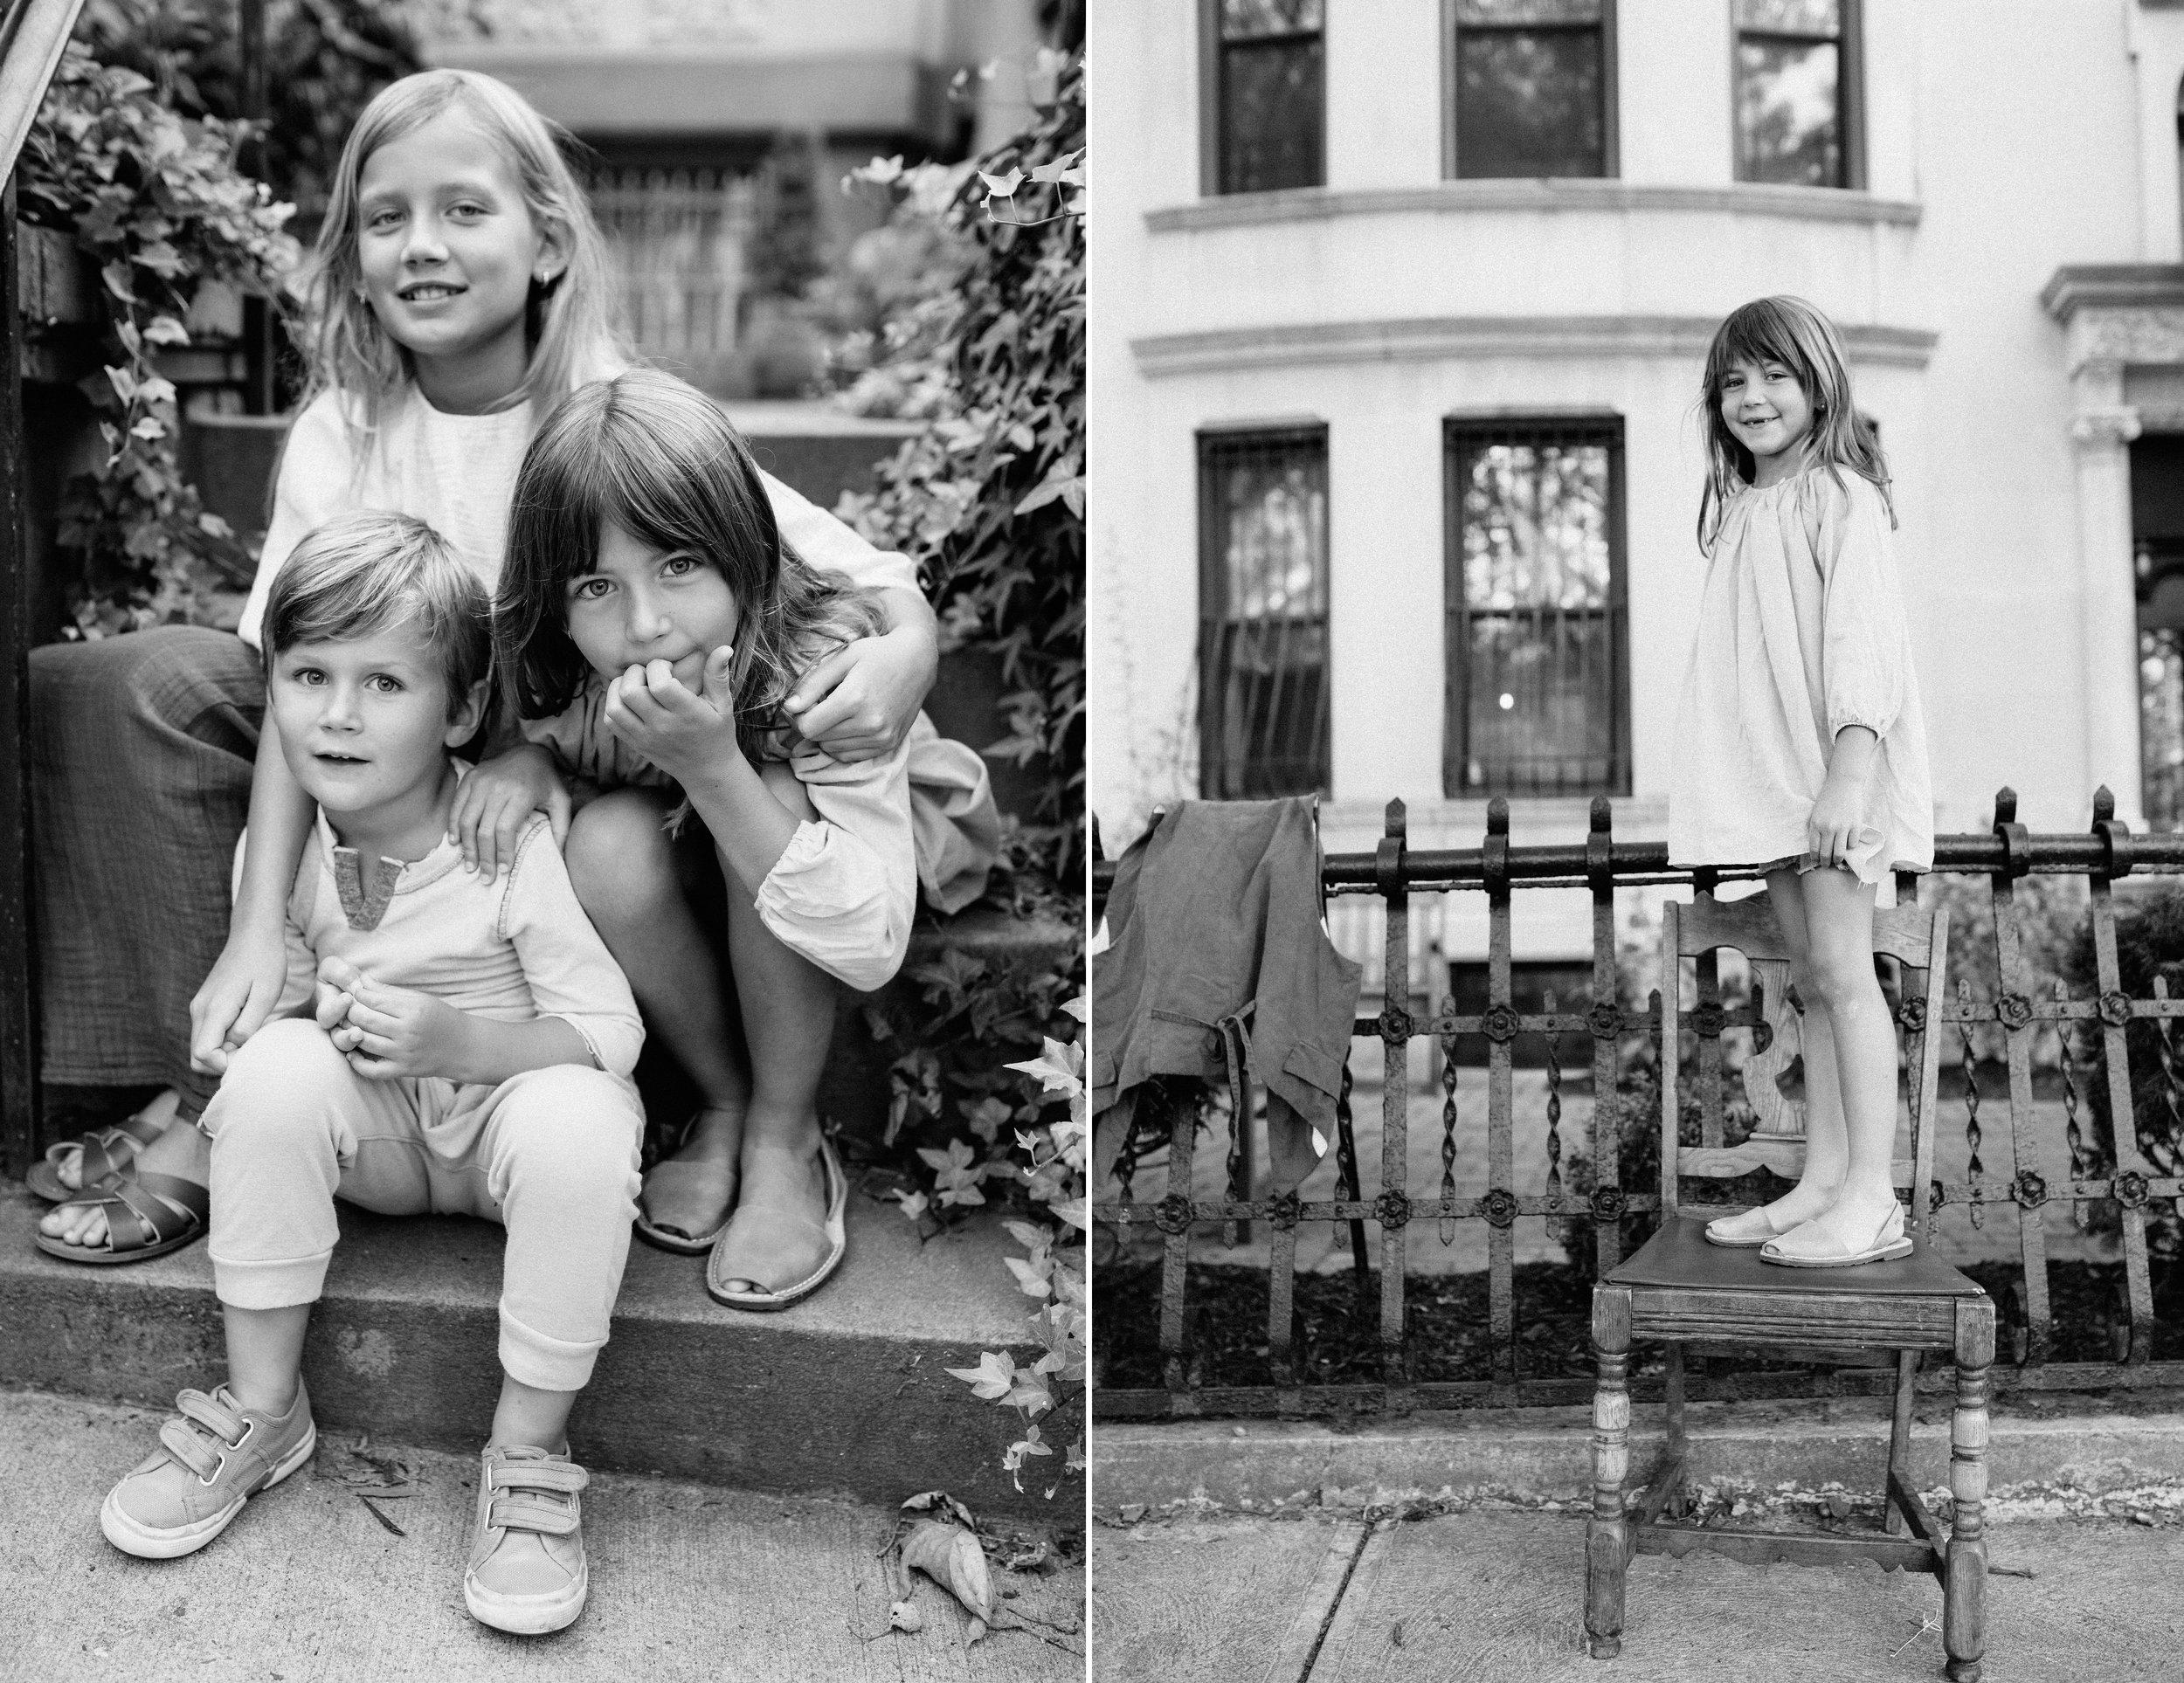 park-slope-brooklyn-family-photography_in-home-session_nicki-sebastian-photography_new-york-20.jpg